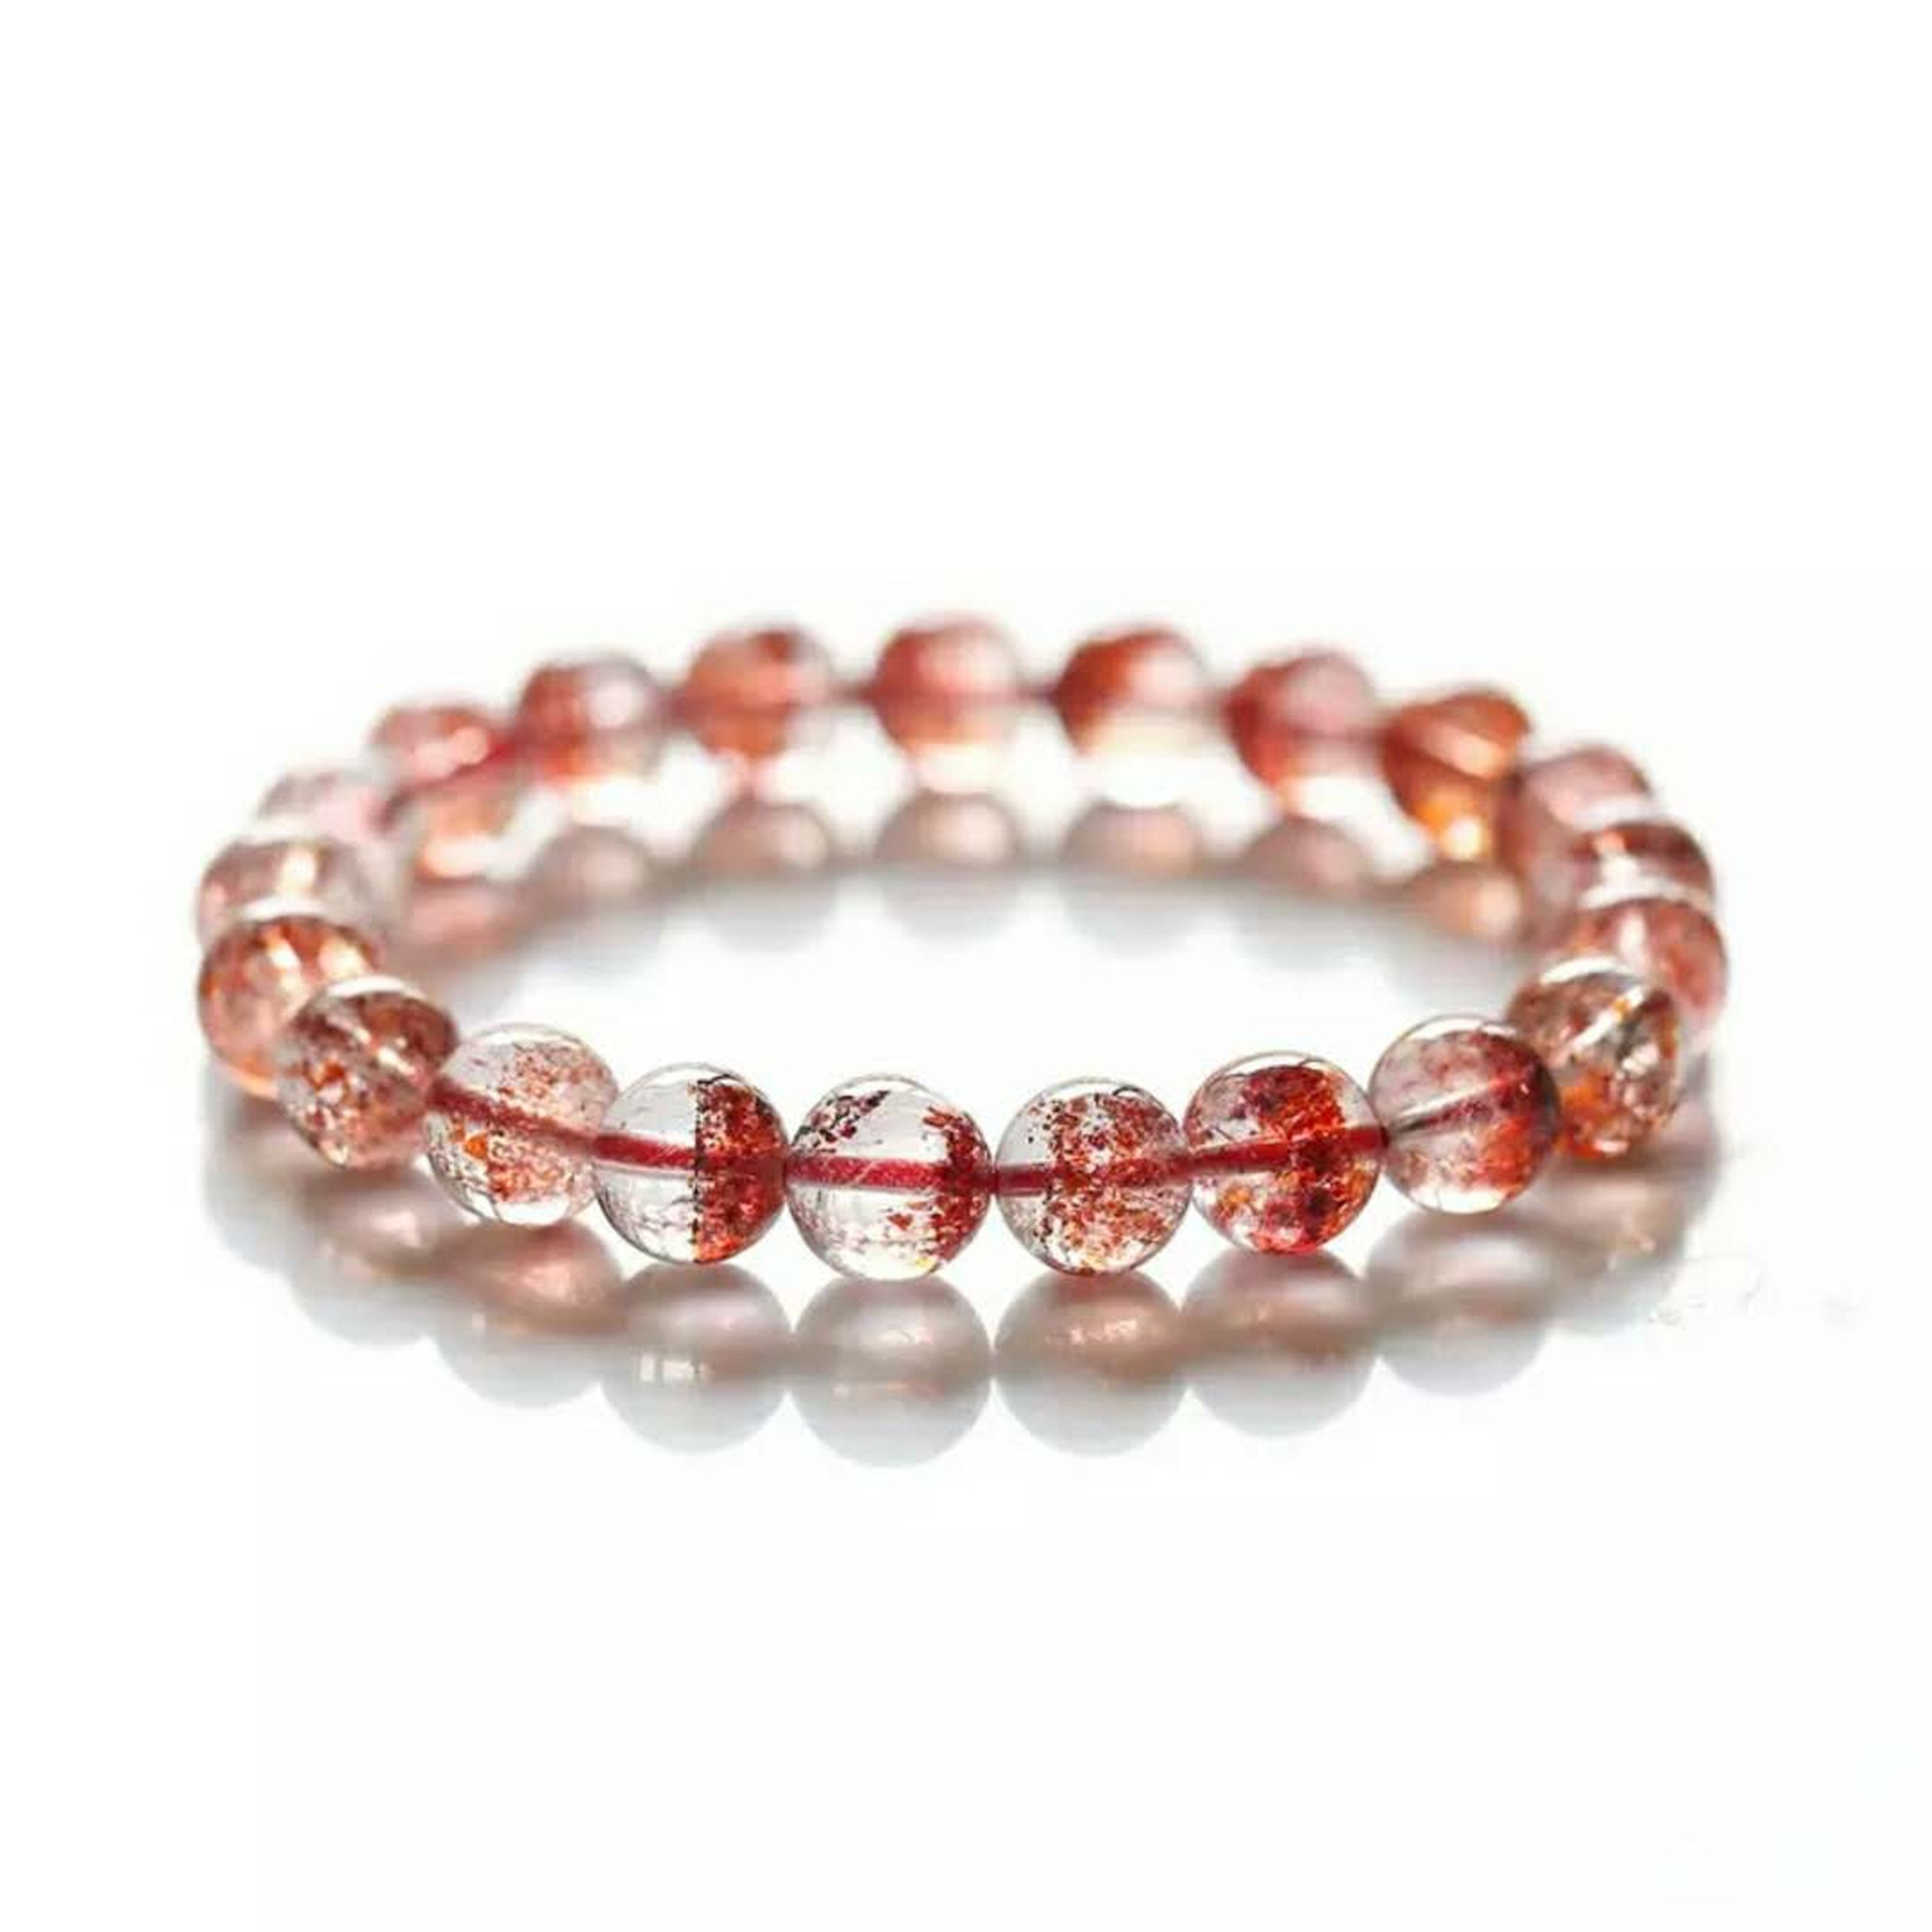 LiZiFang Golden Natural Strawberry Quartz Bracelet Crystal Lepidocrocite Super Seven Melody Stone Stretch Round Bead Bracelet 9mm